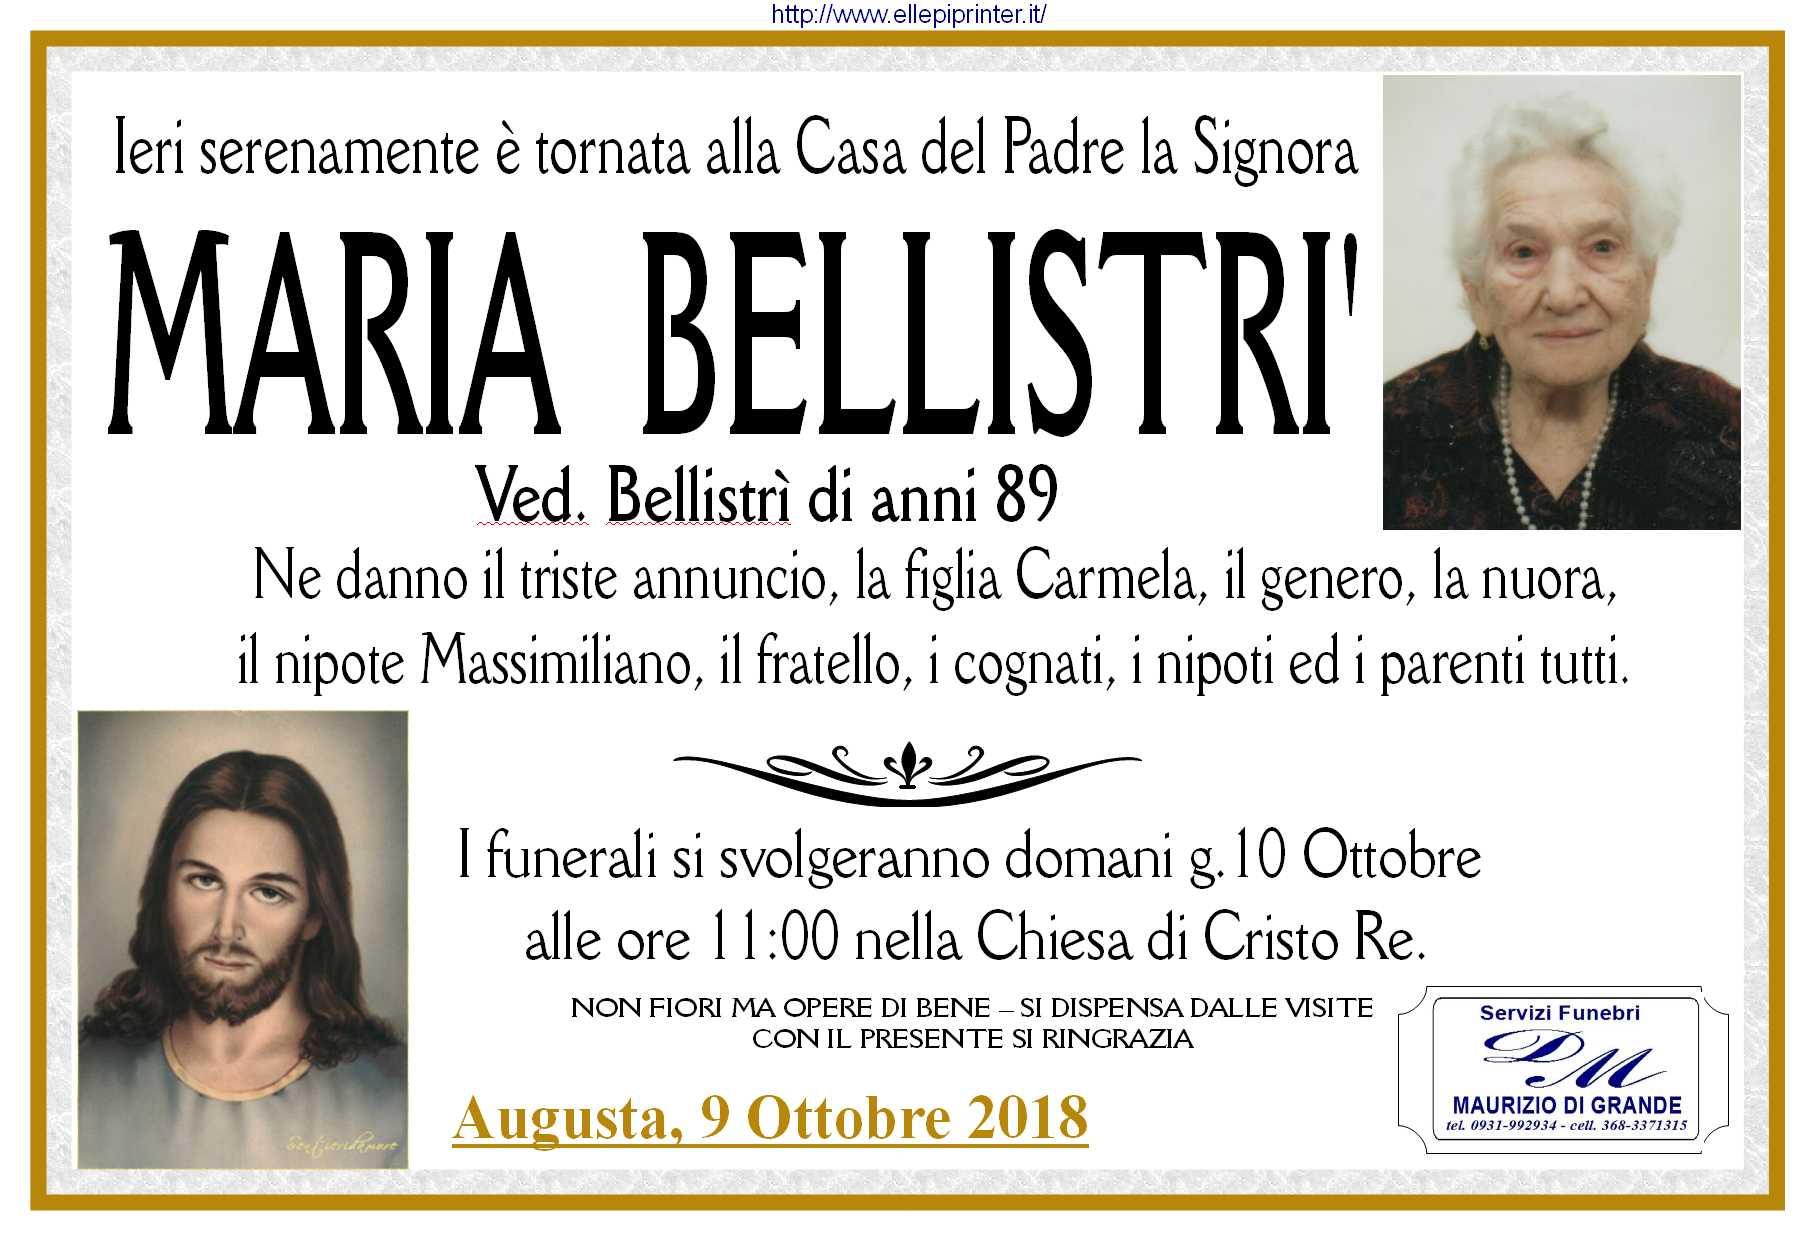 Maria Bellistri man